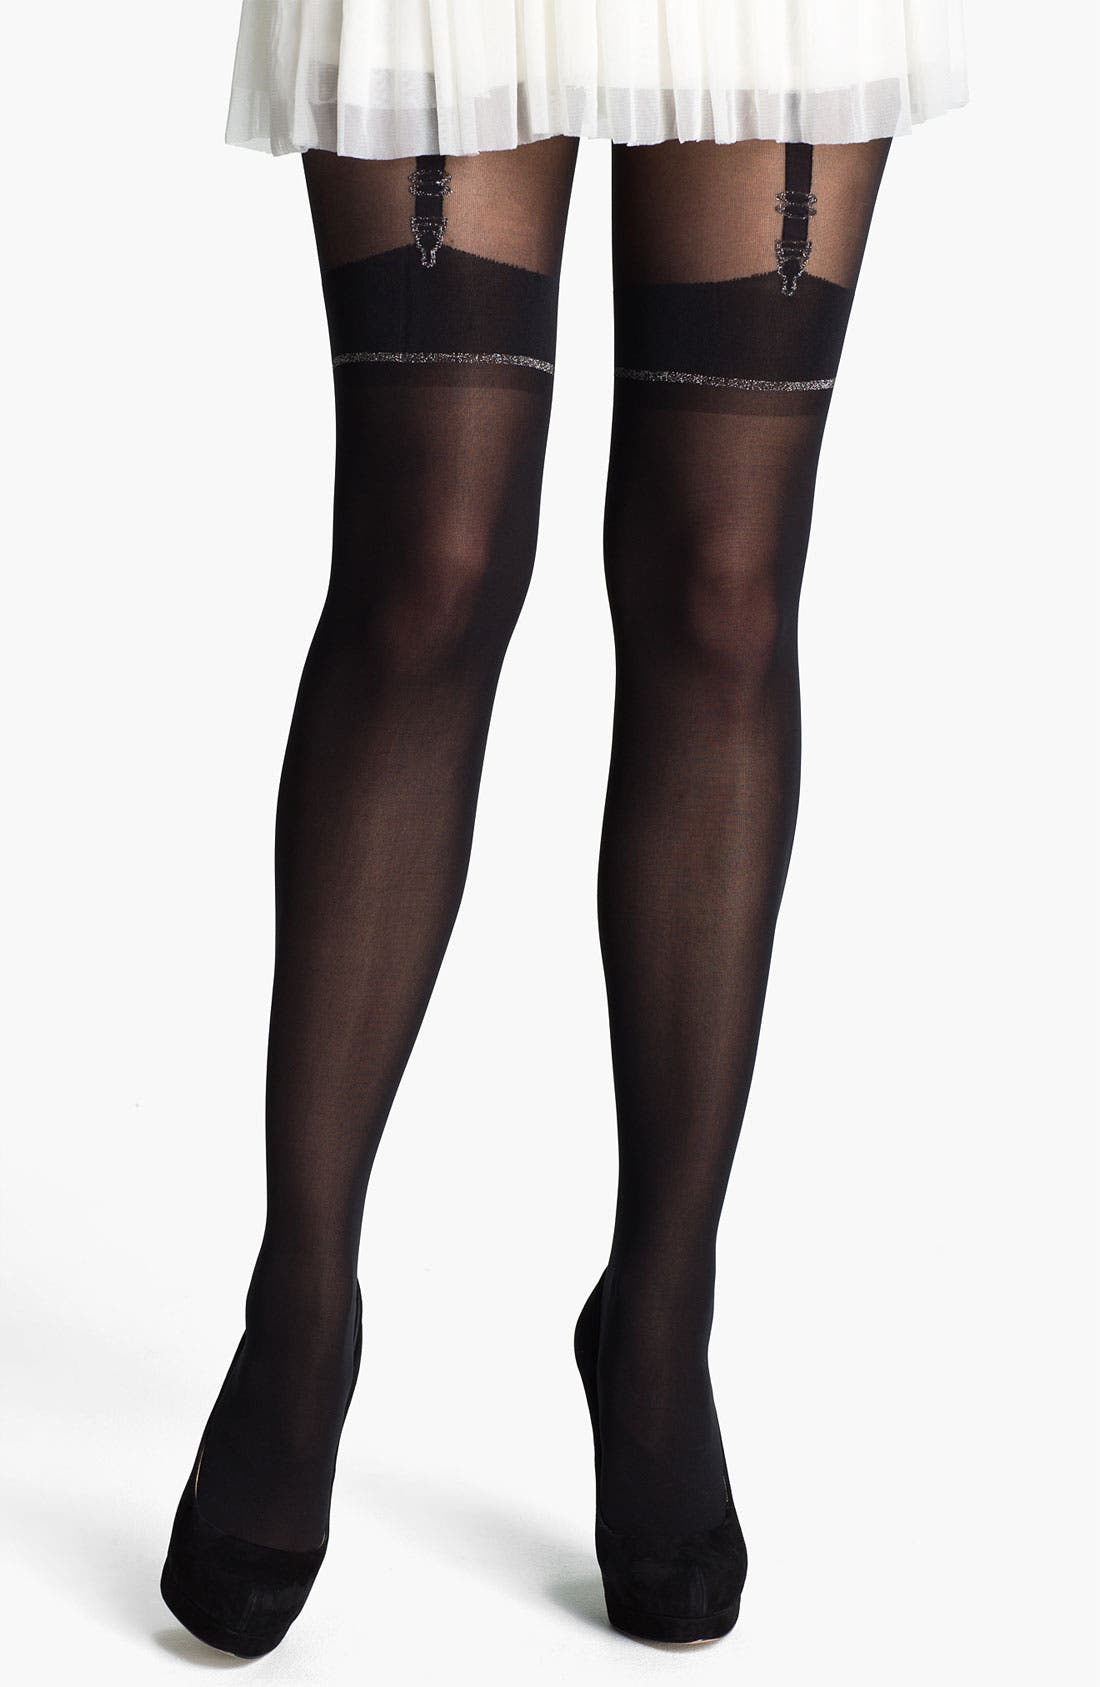 Main Image - Pretty Polly 'Stunning' Mock Suspender Tights